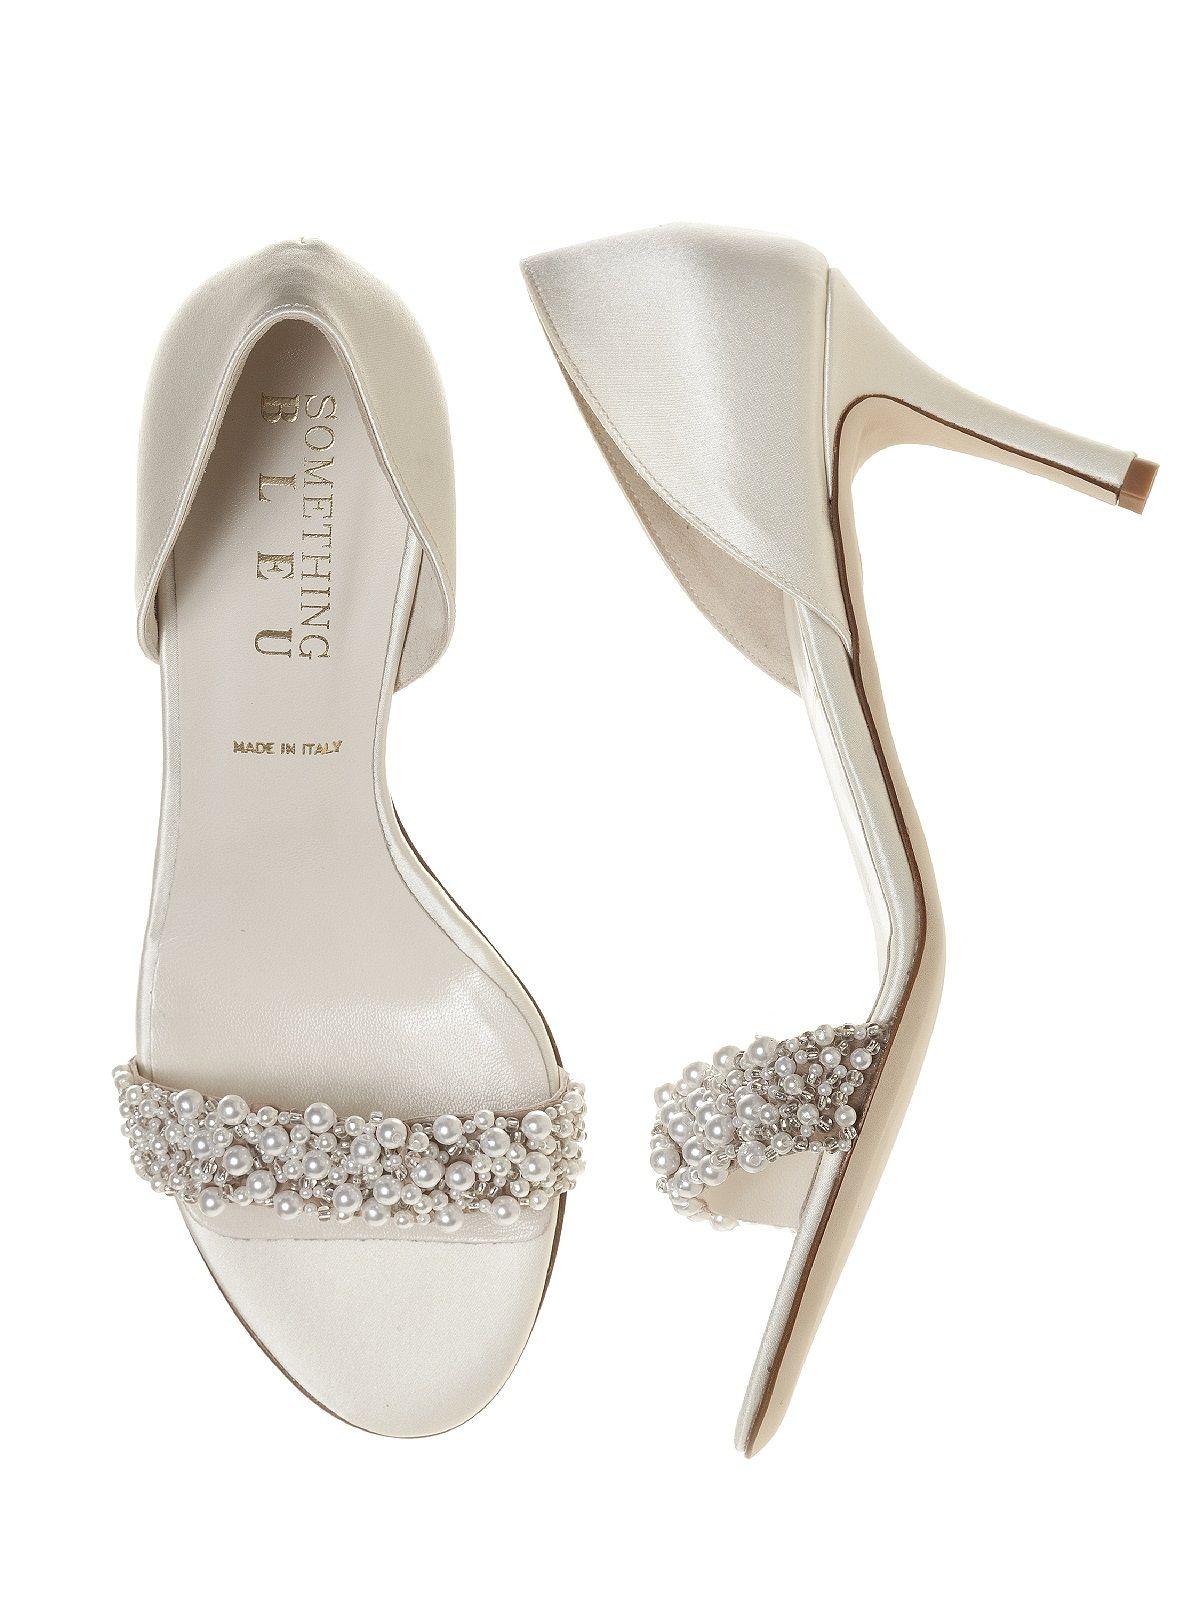 cappy pearl dorsay ivory satin bridal shoes